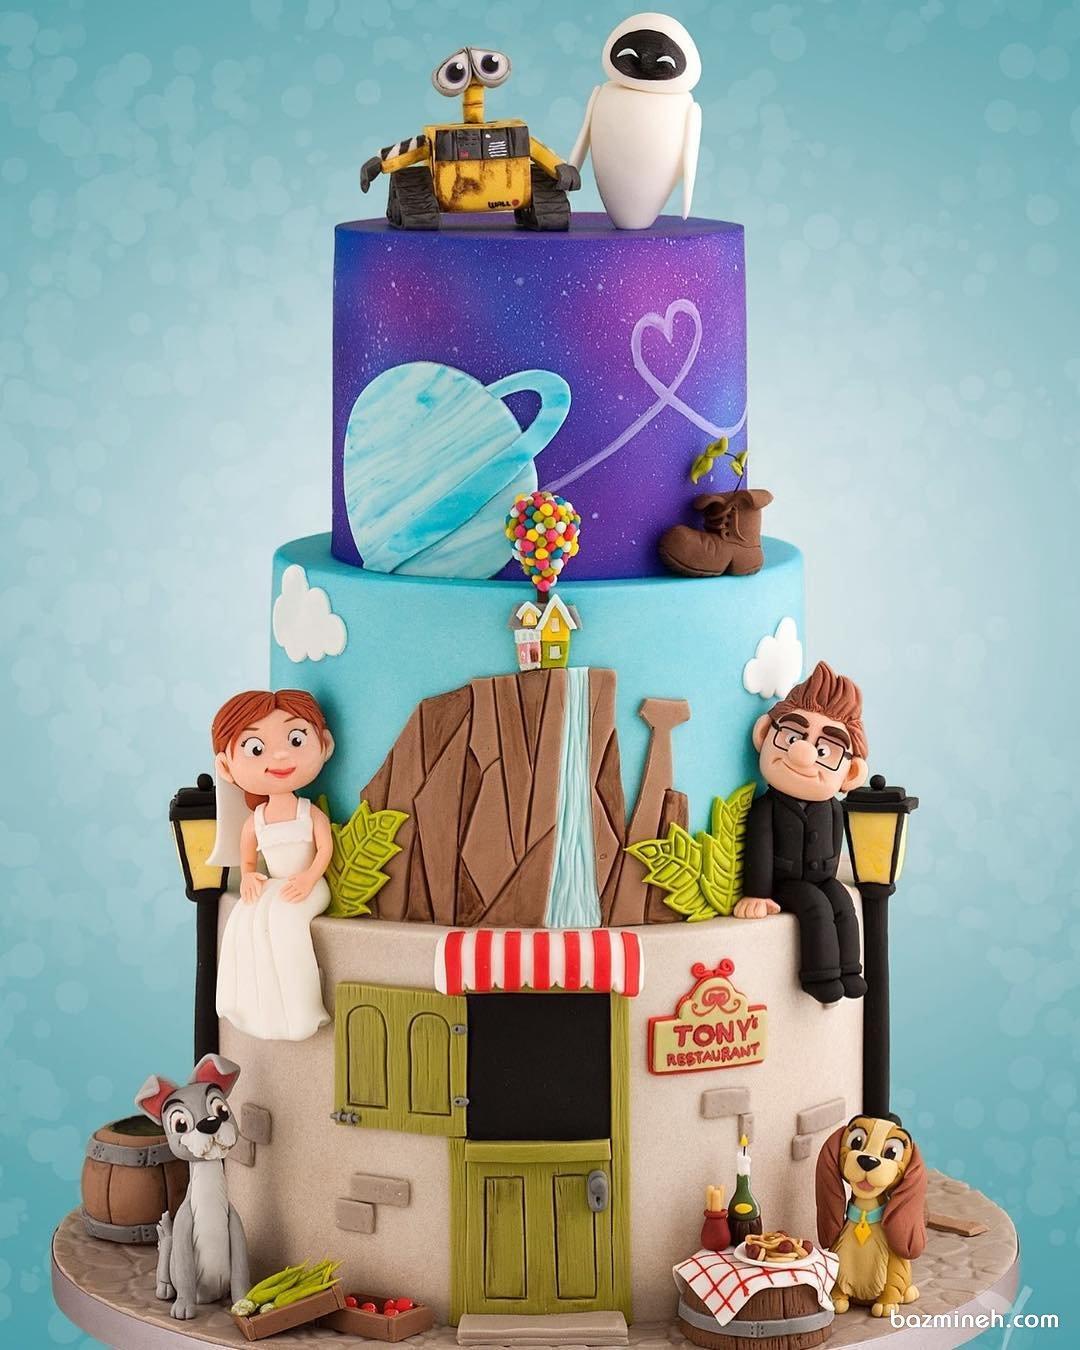 کیک فوندانت جشن تولد کودک با تم کارتونی